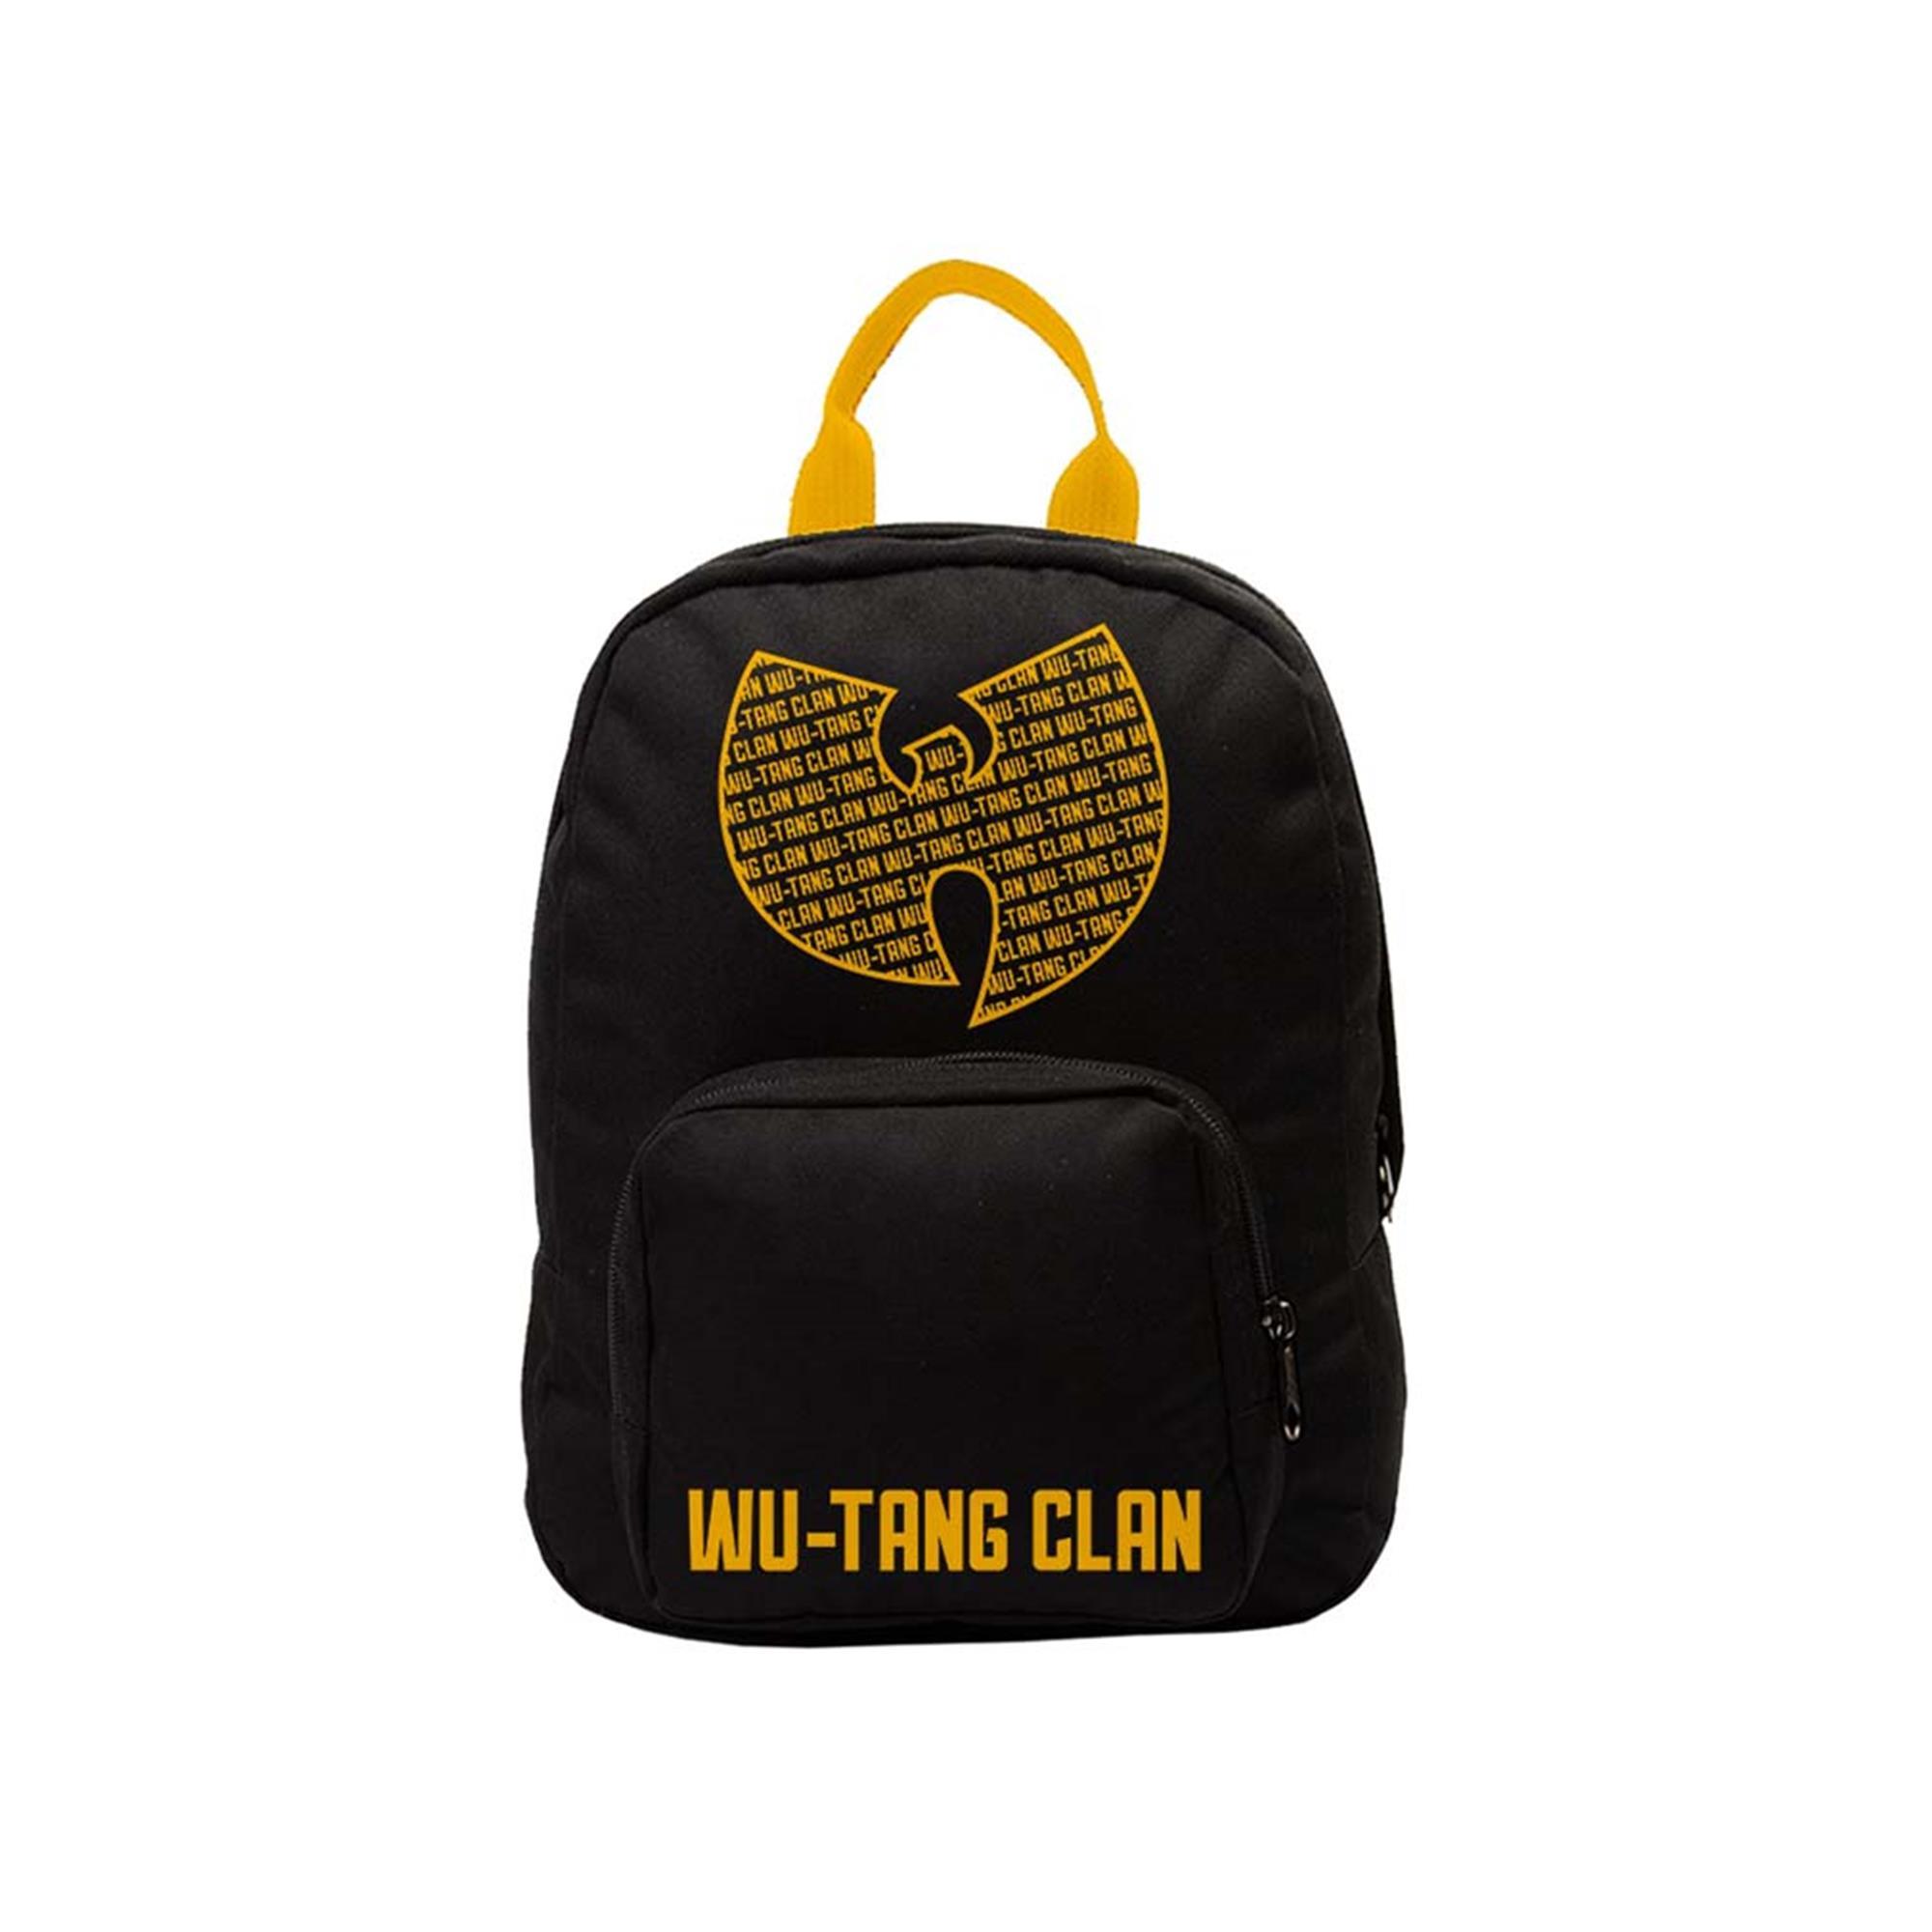 Wu-Tang Ain't Nuthing Kids Backpack